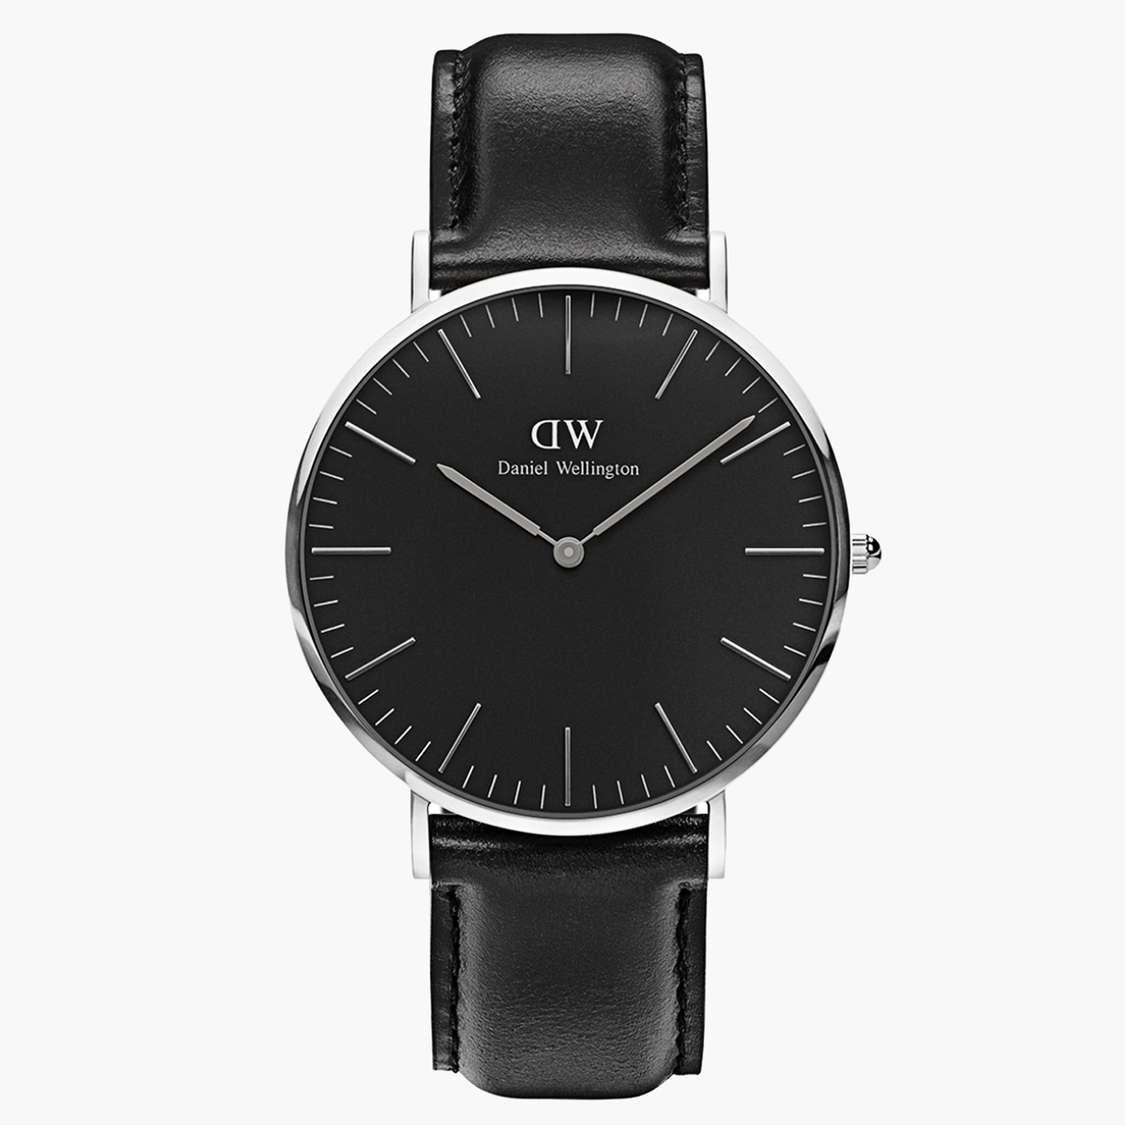 DANIEL WELLINGTON Men Analog Watch with Leather Strap - DW00100133